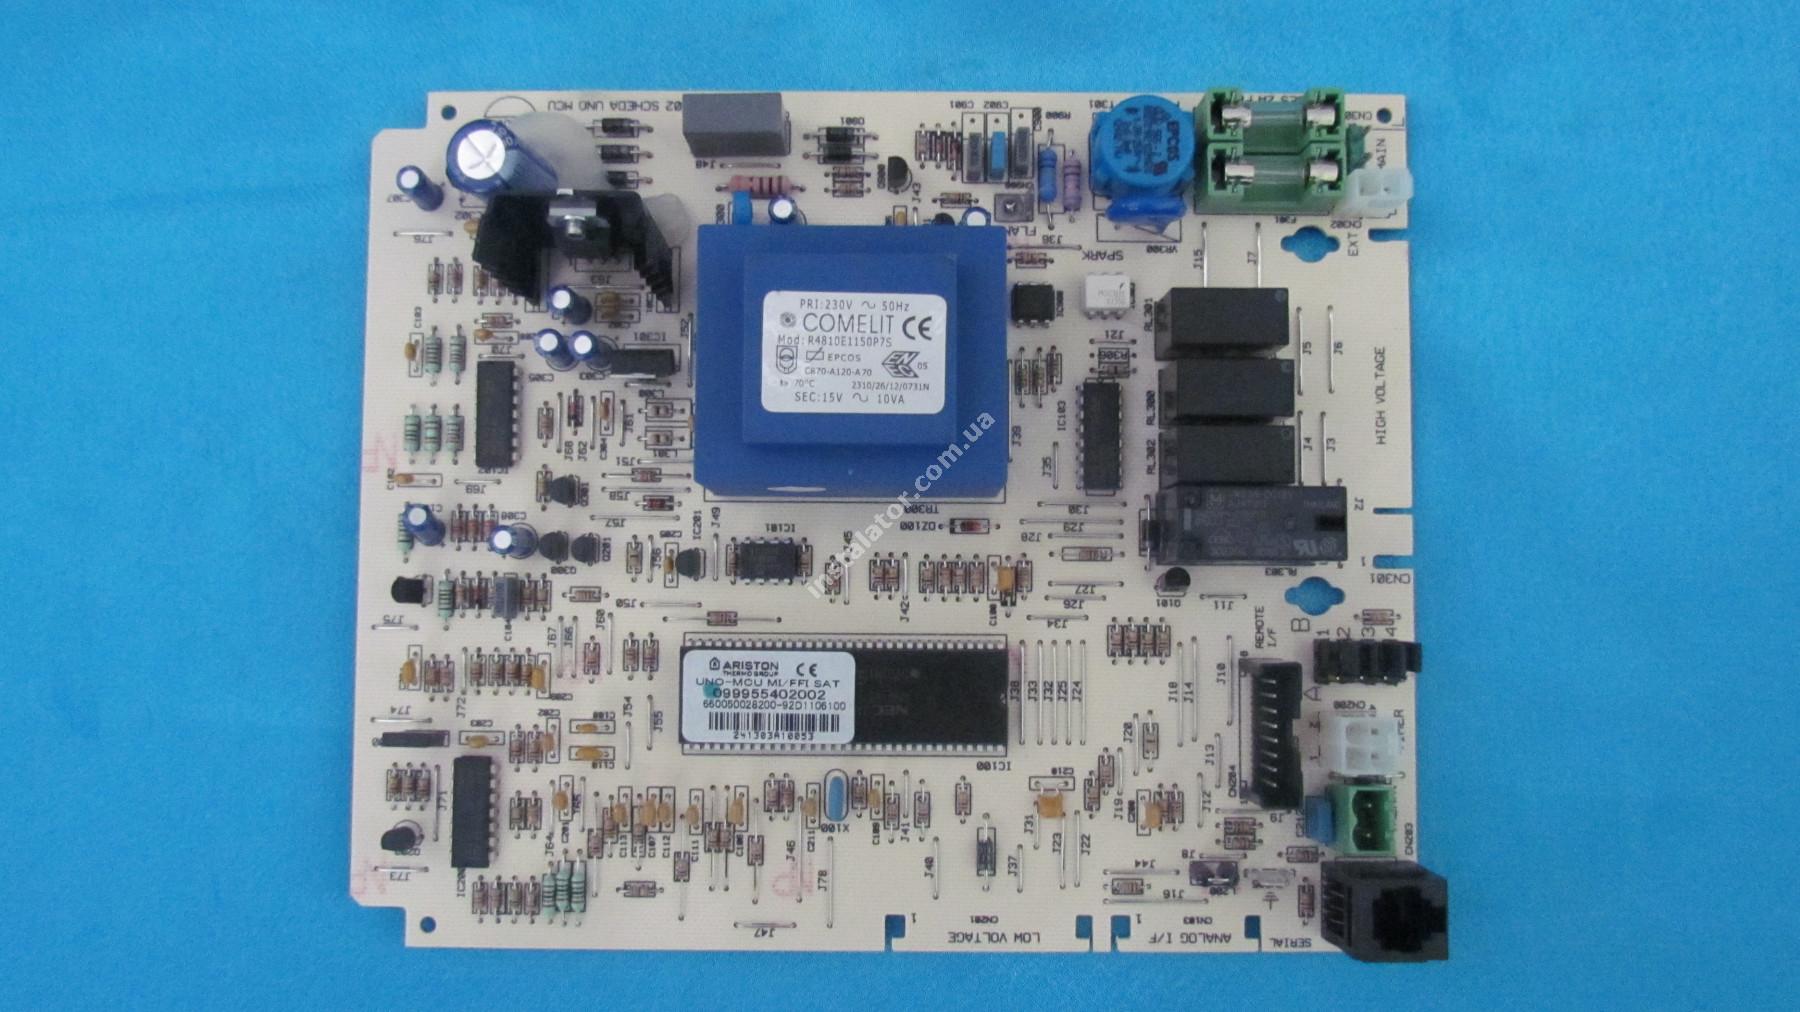 65100729 Плата електронна ARISTON Uno full-image-0